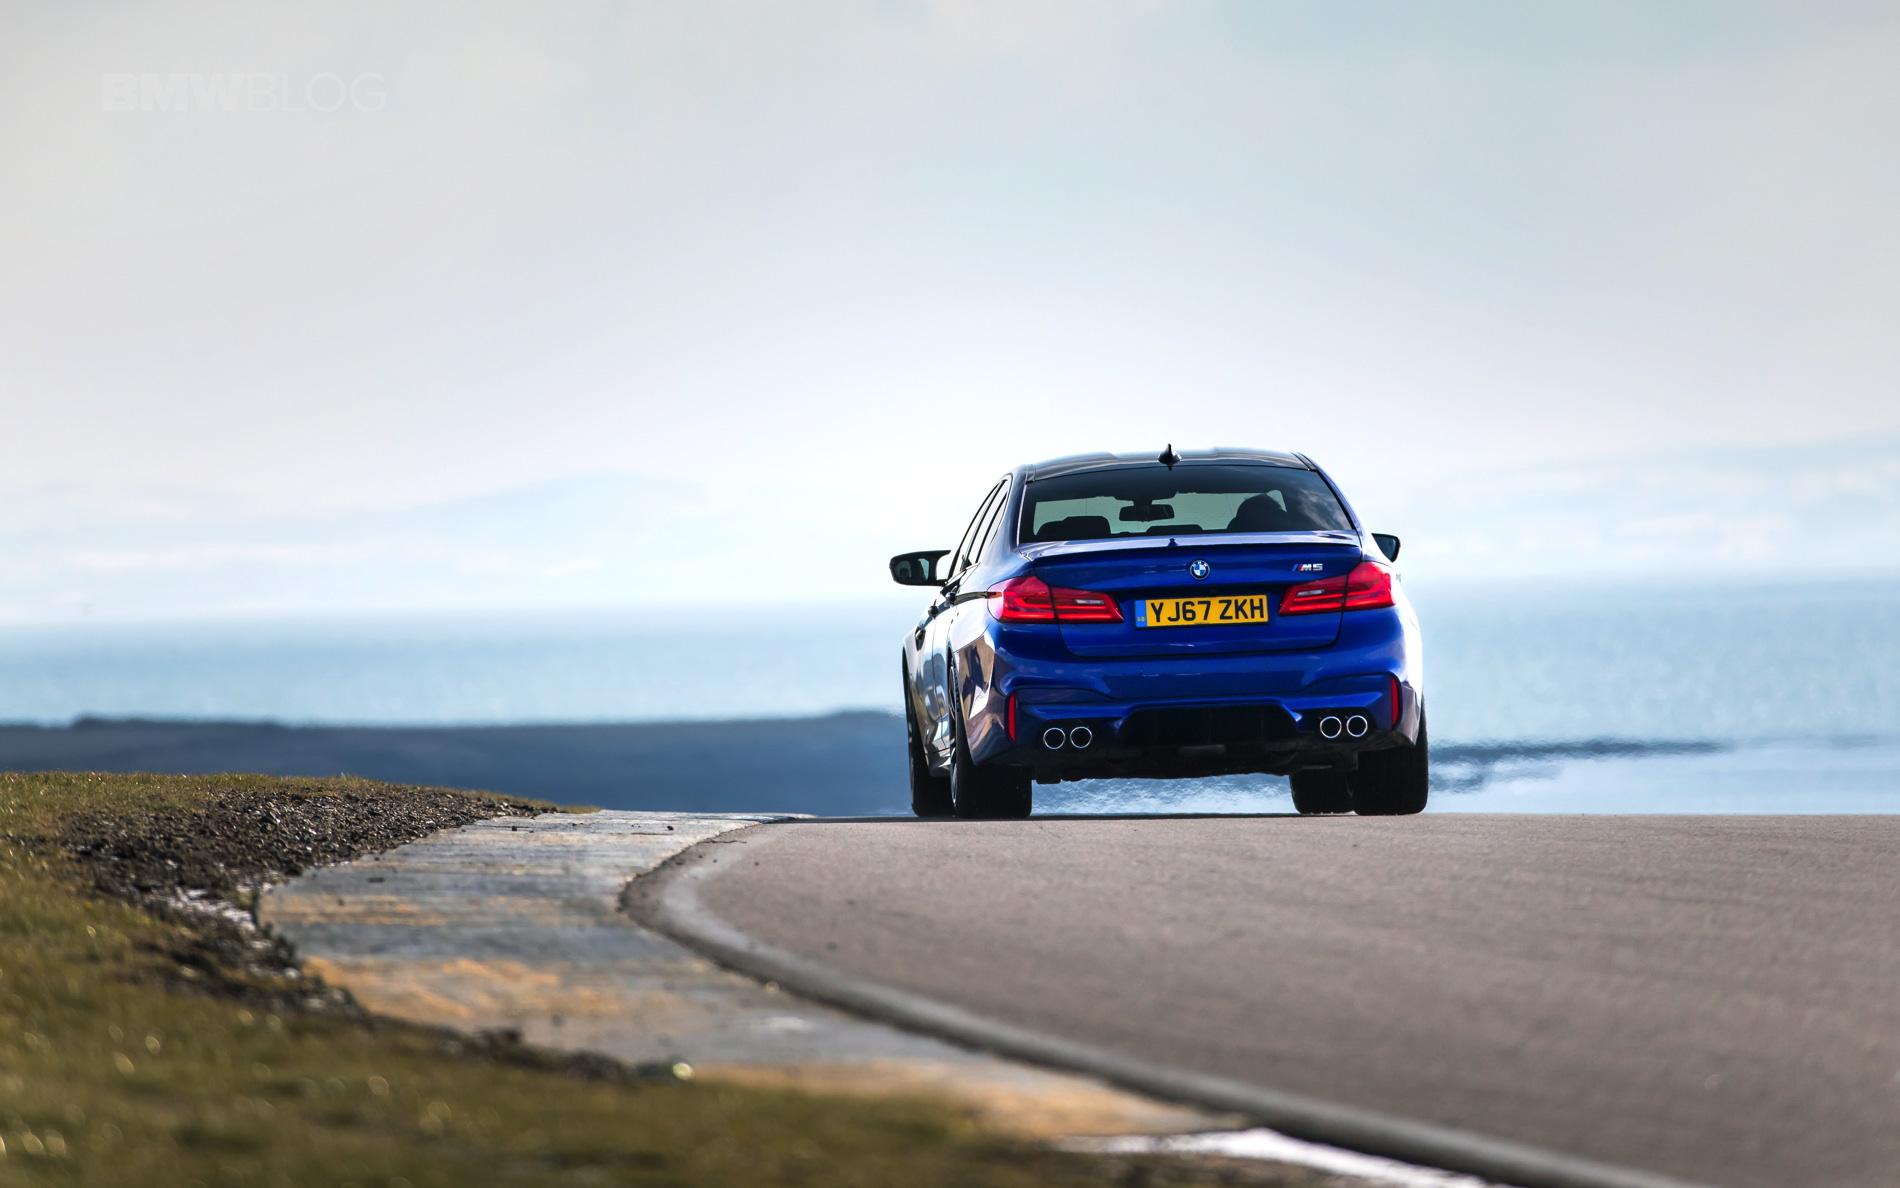 VIDEO: F90 BMW M5 vs Mercedes-AMG E63 S -- Drag Race